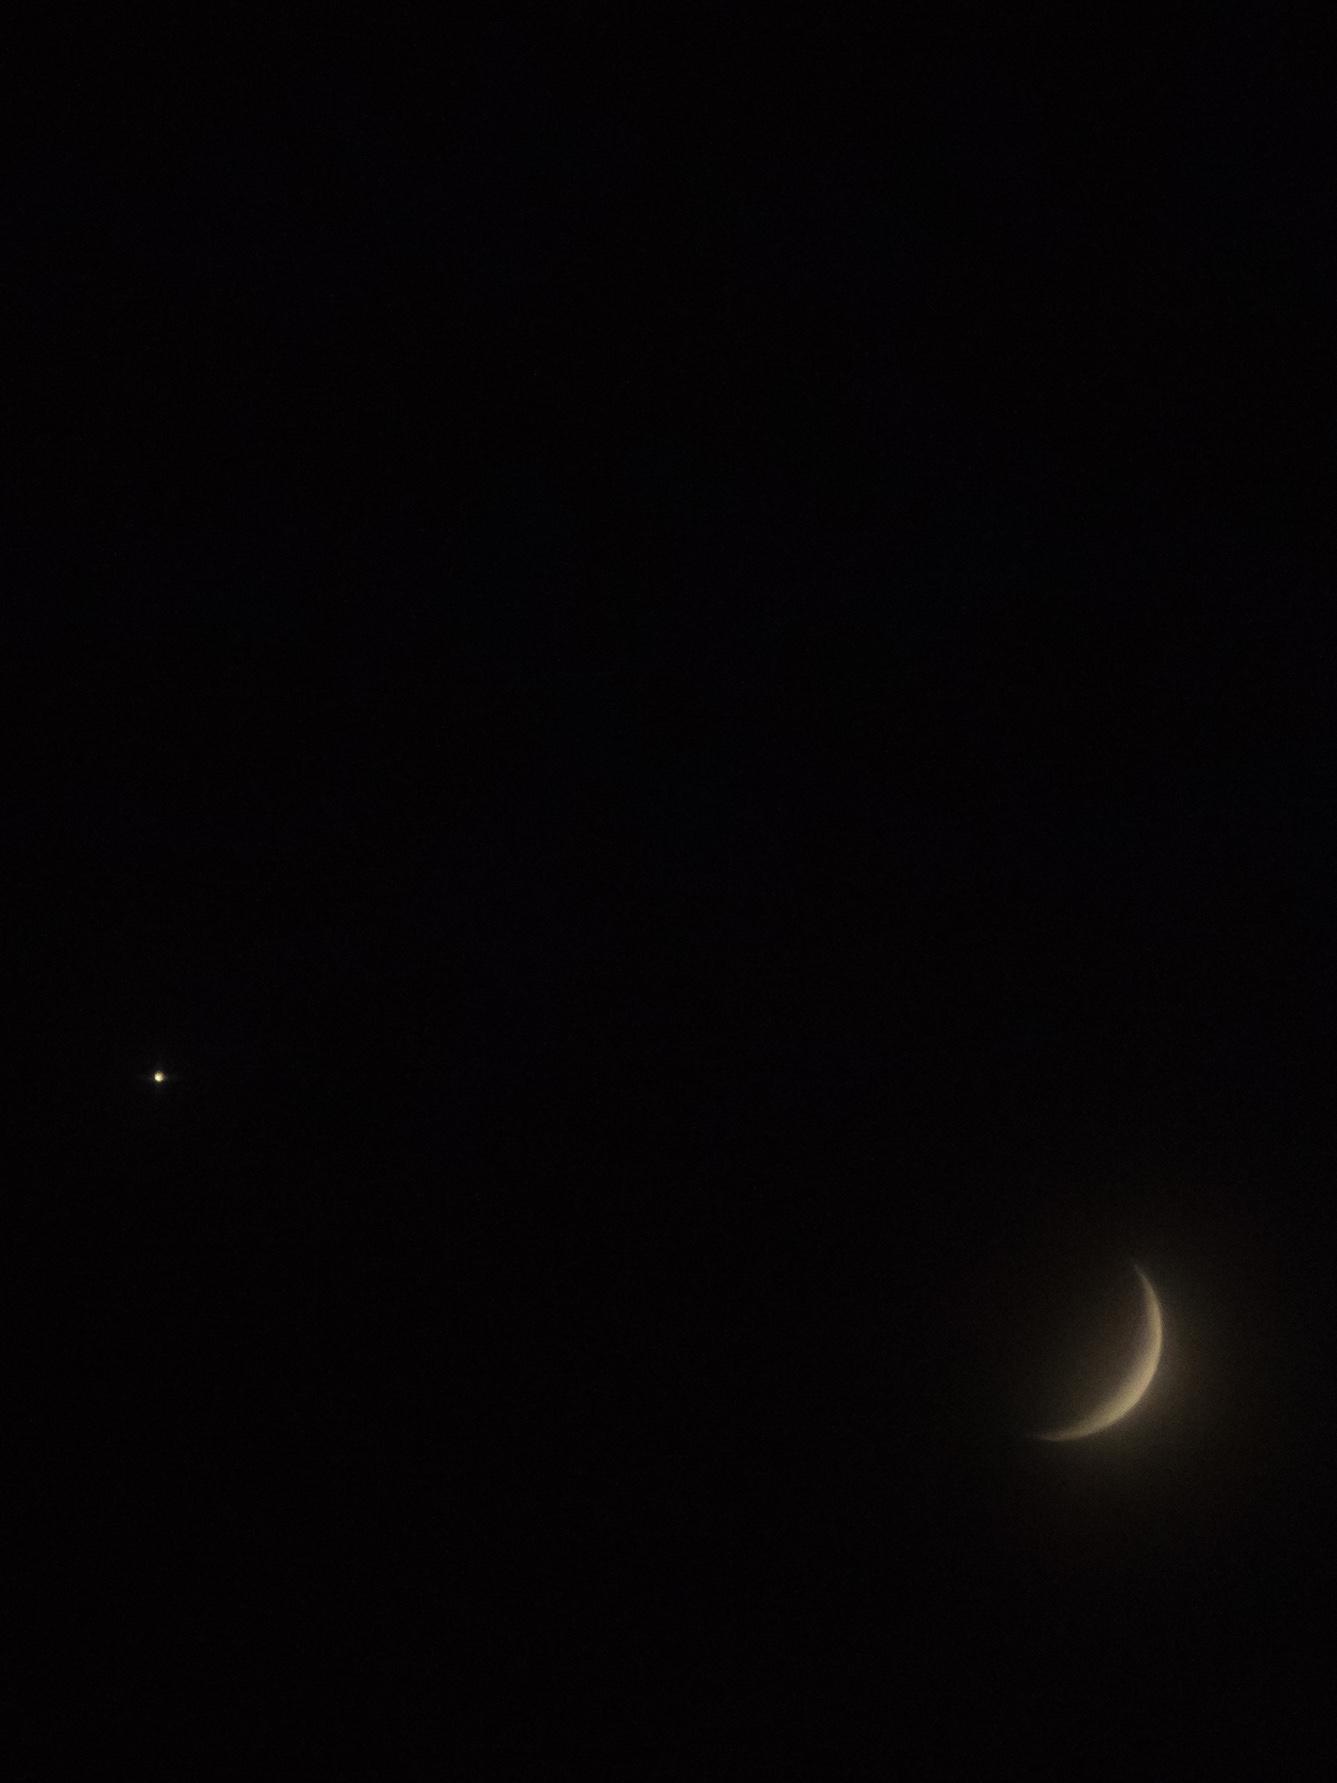 Waxing Crescent Moon and Venus | 20190715 2104 W:38.96x77.00@77m